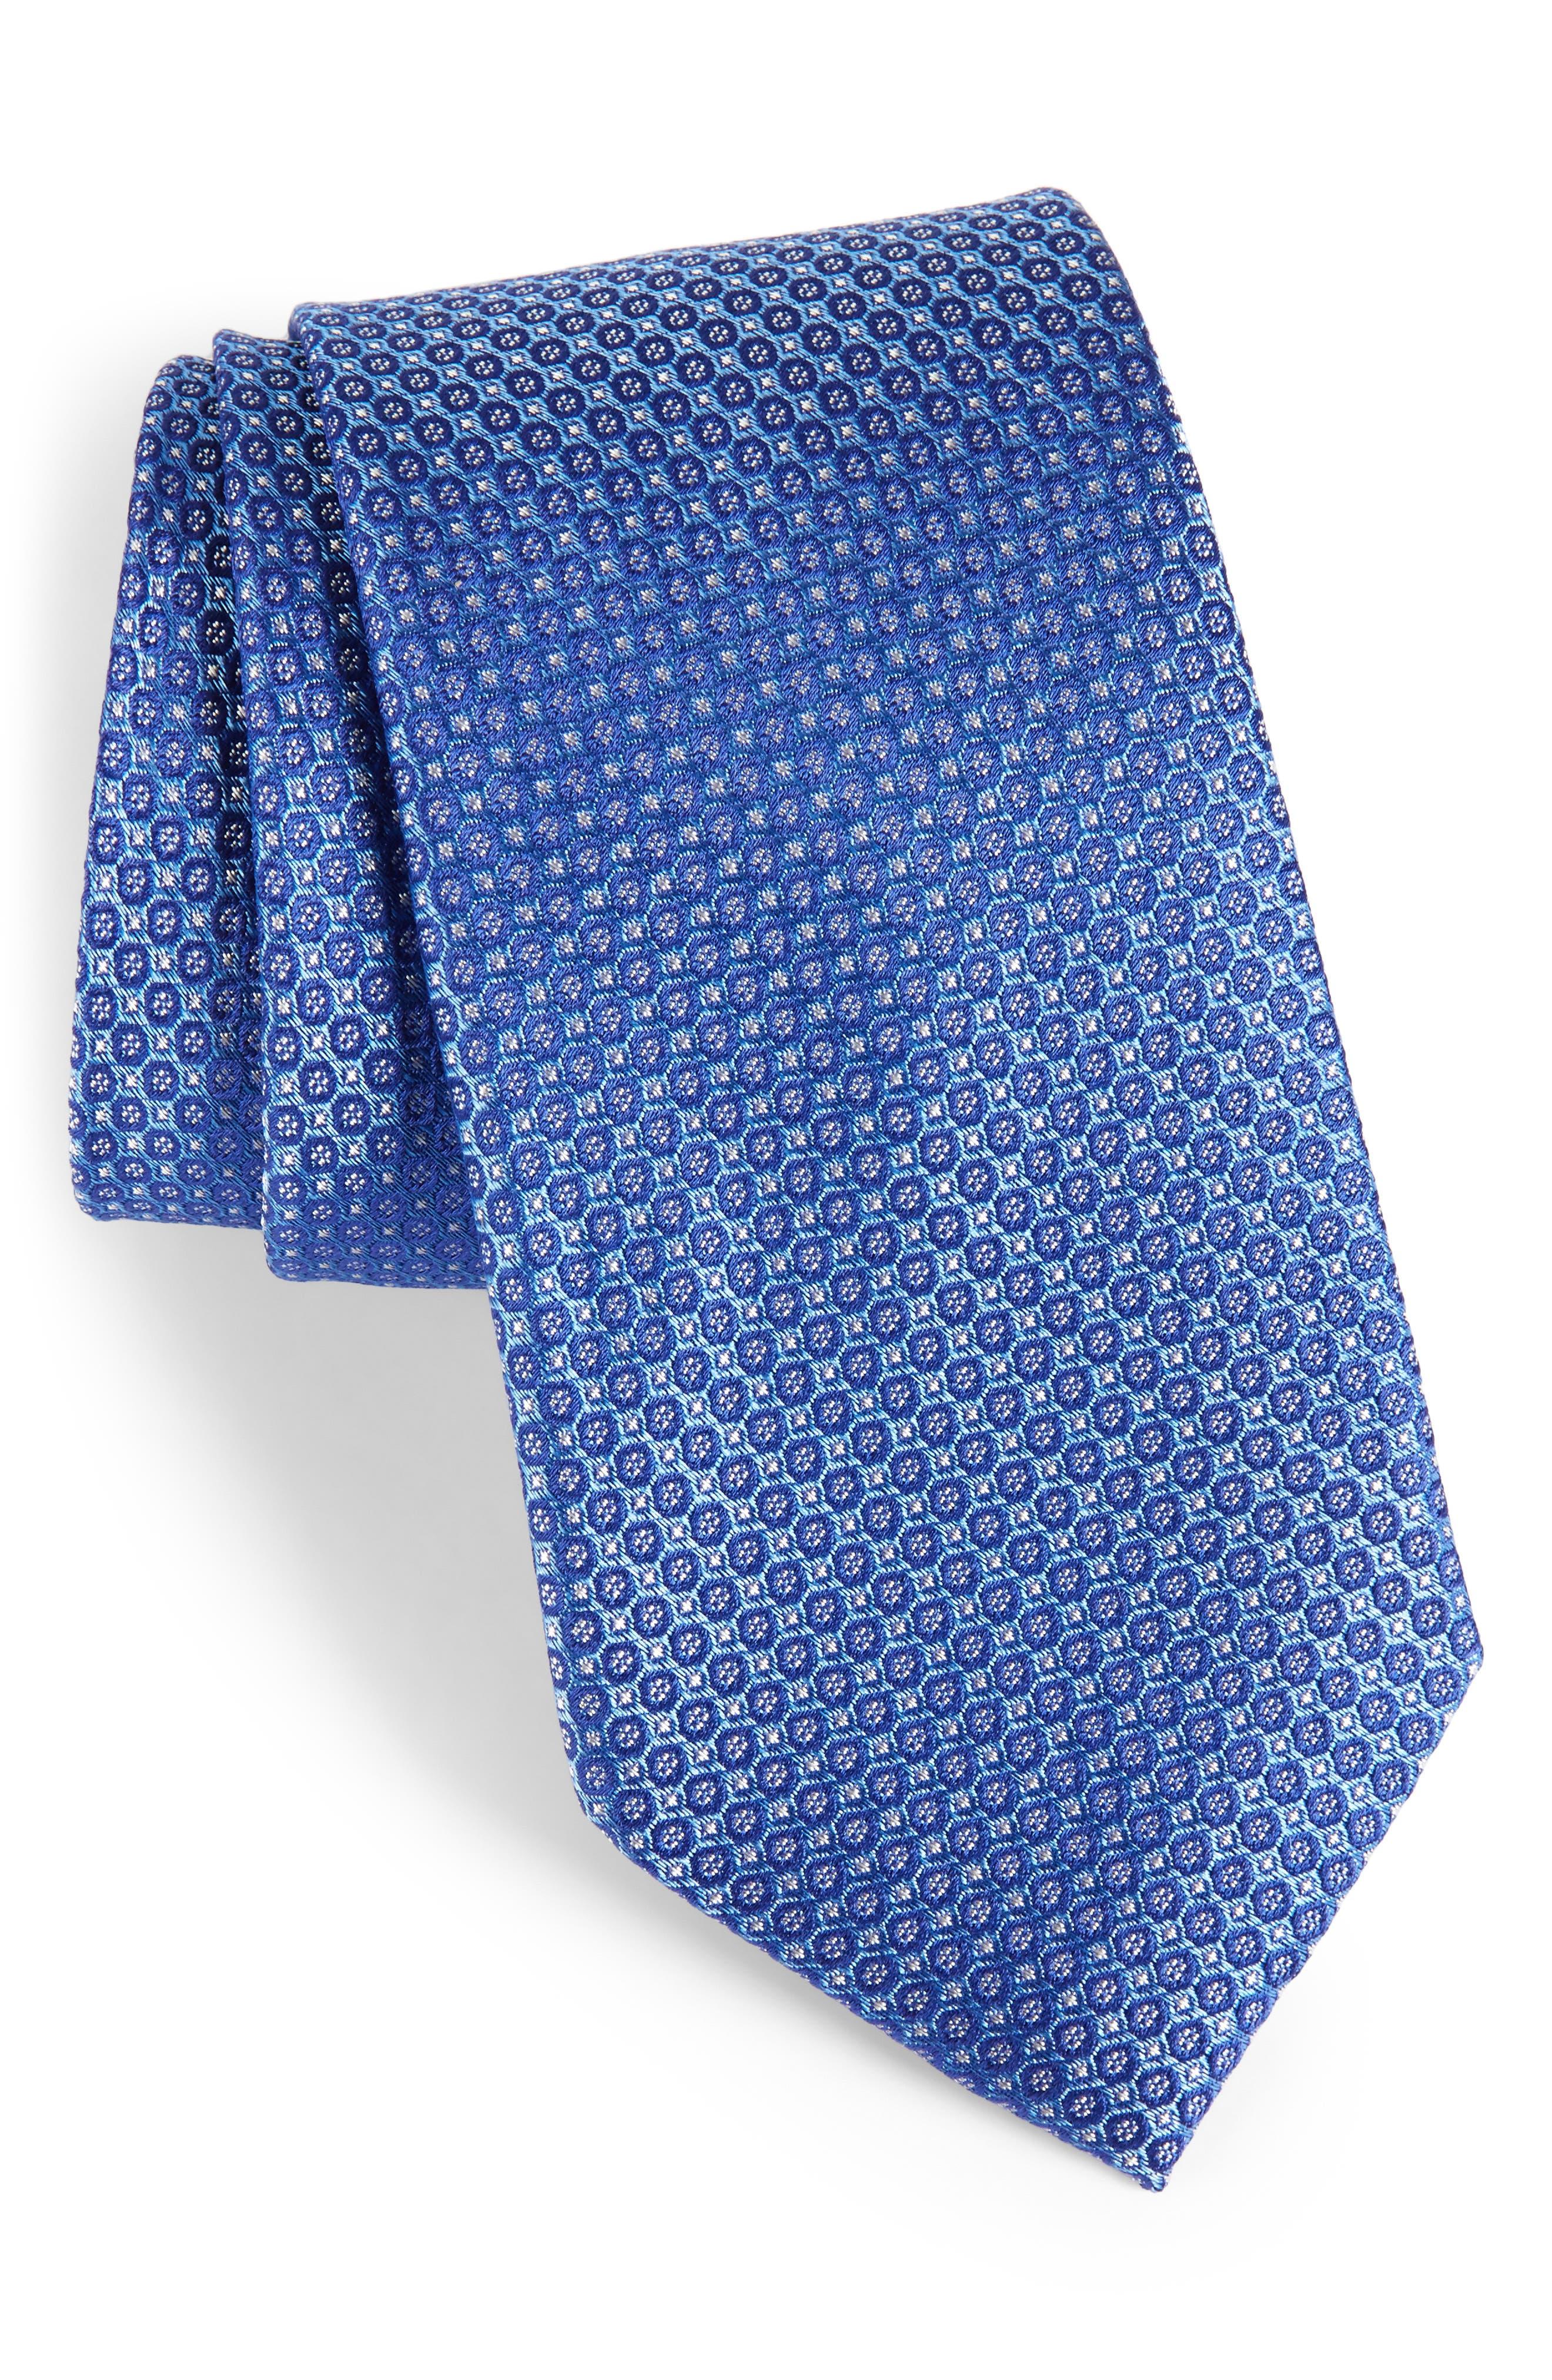 Main Image - Nordstrom Men's Shop Park Ave Solid Silk Tie